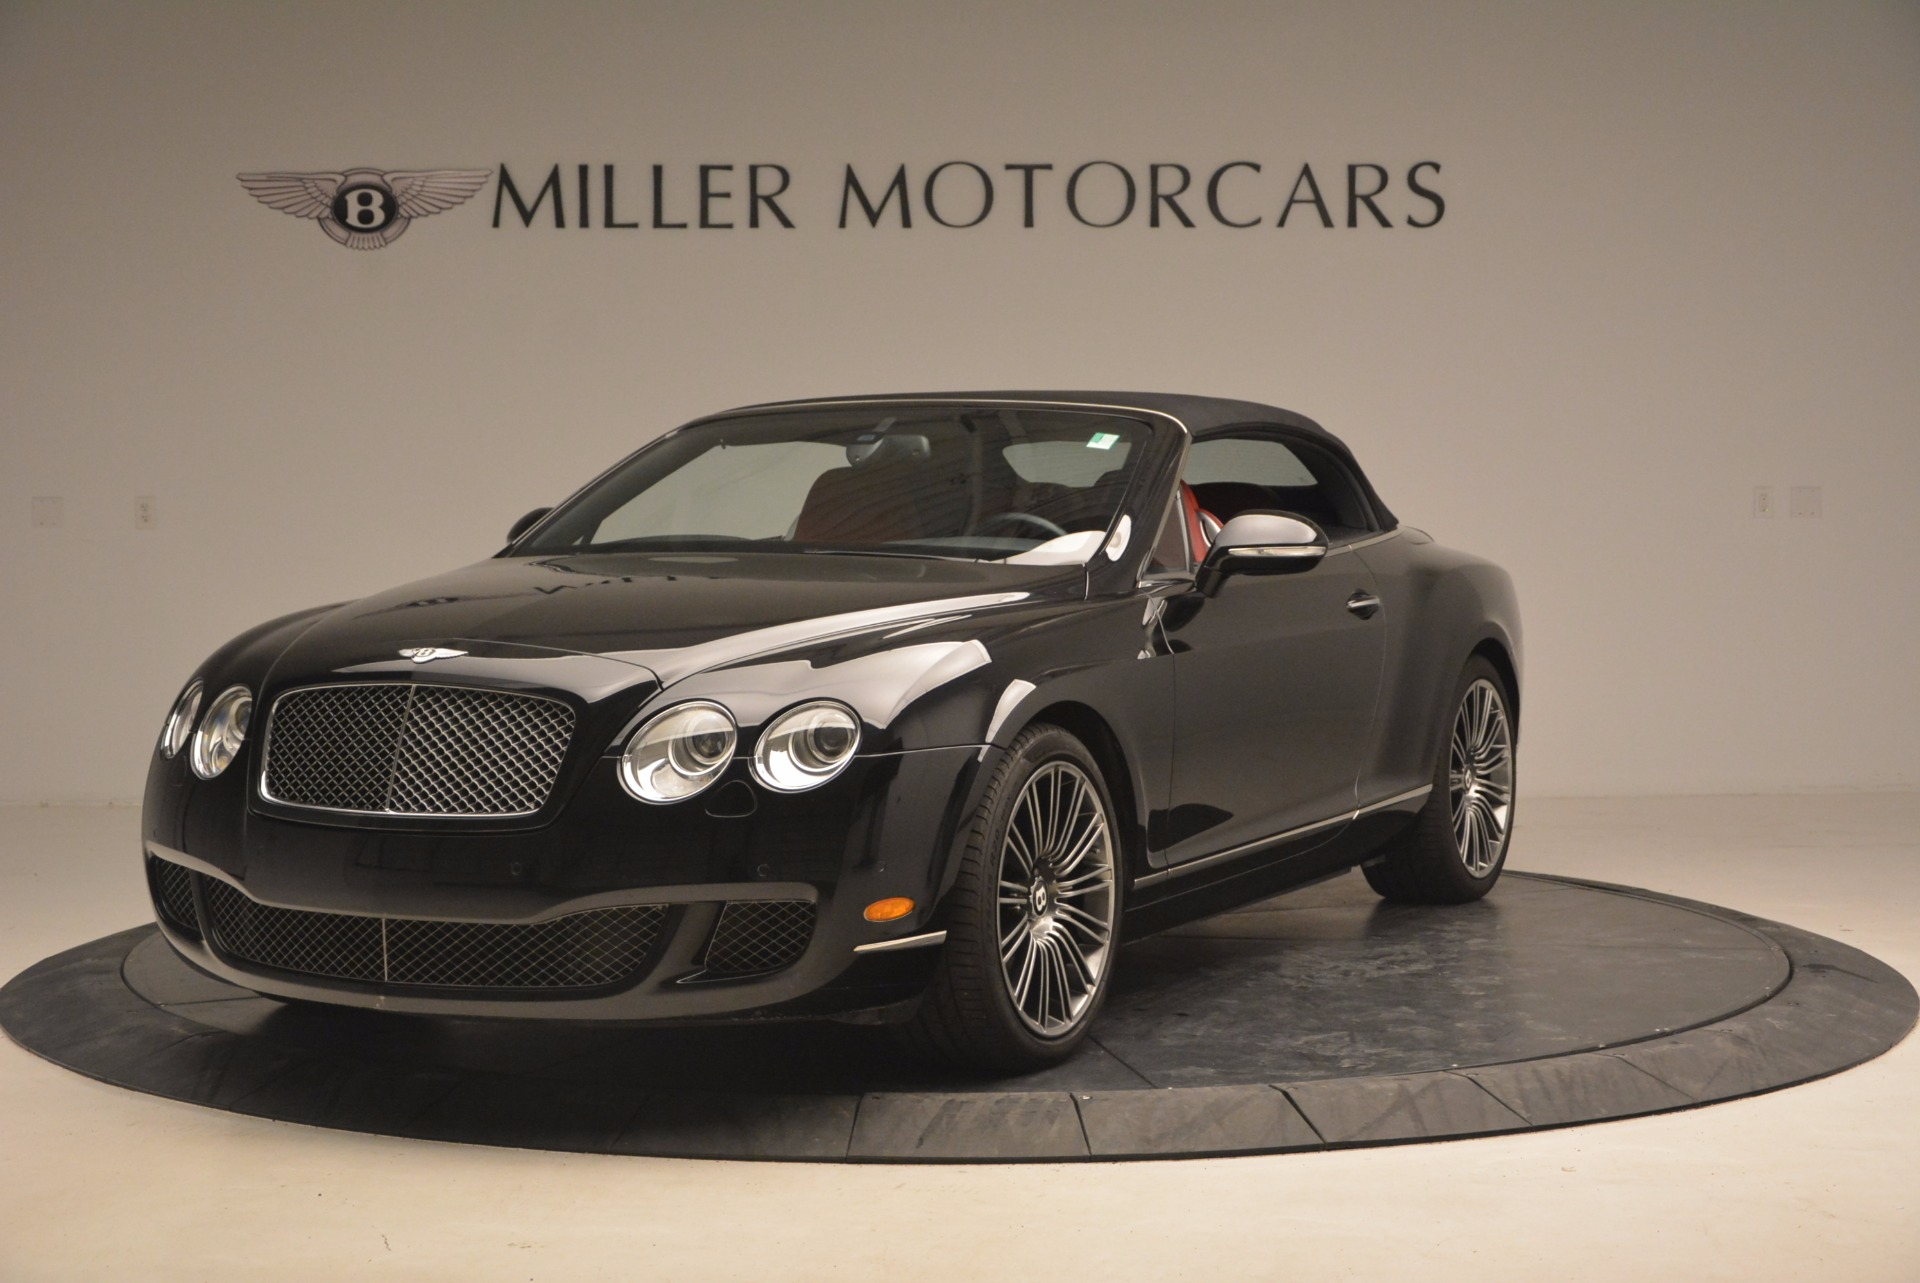 Used 2010 Bentley Continental GT Speed For Sale In Westport, CT 1298_p14